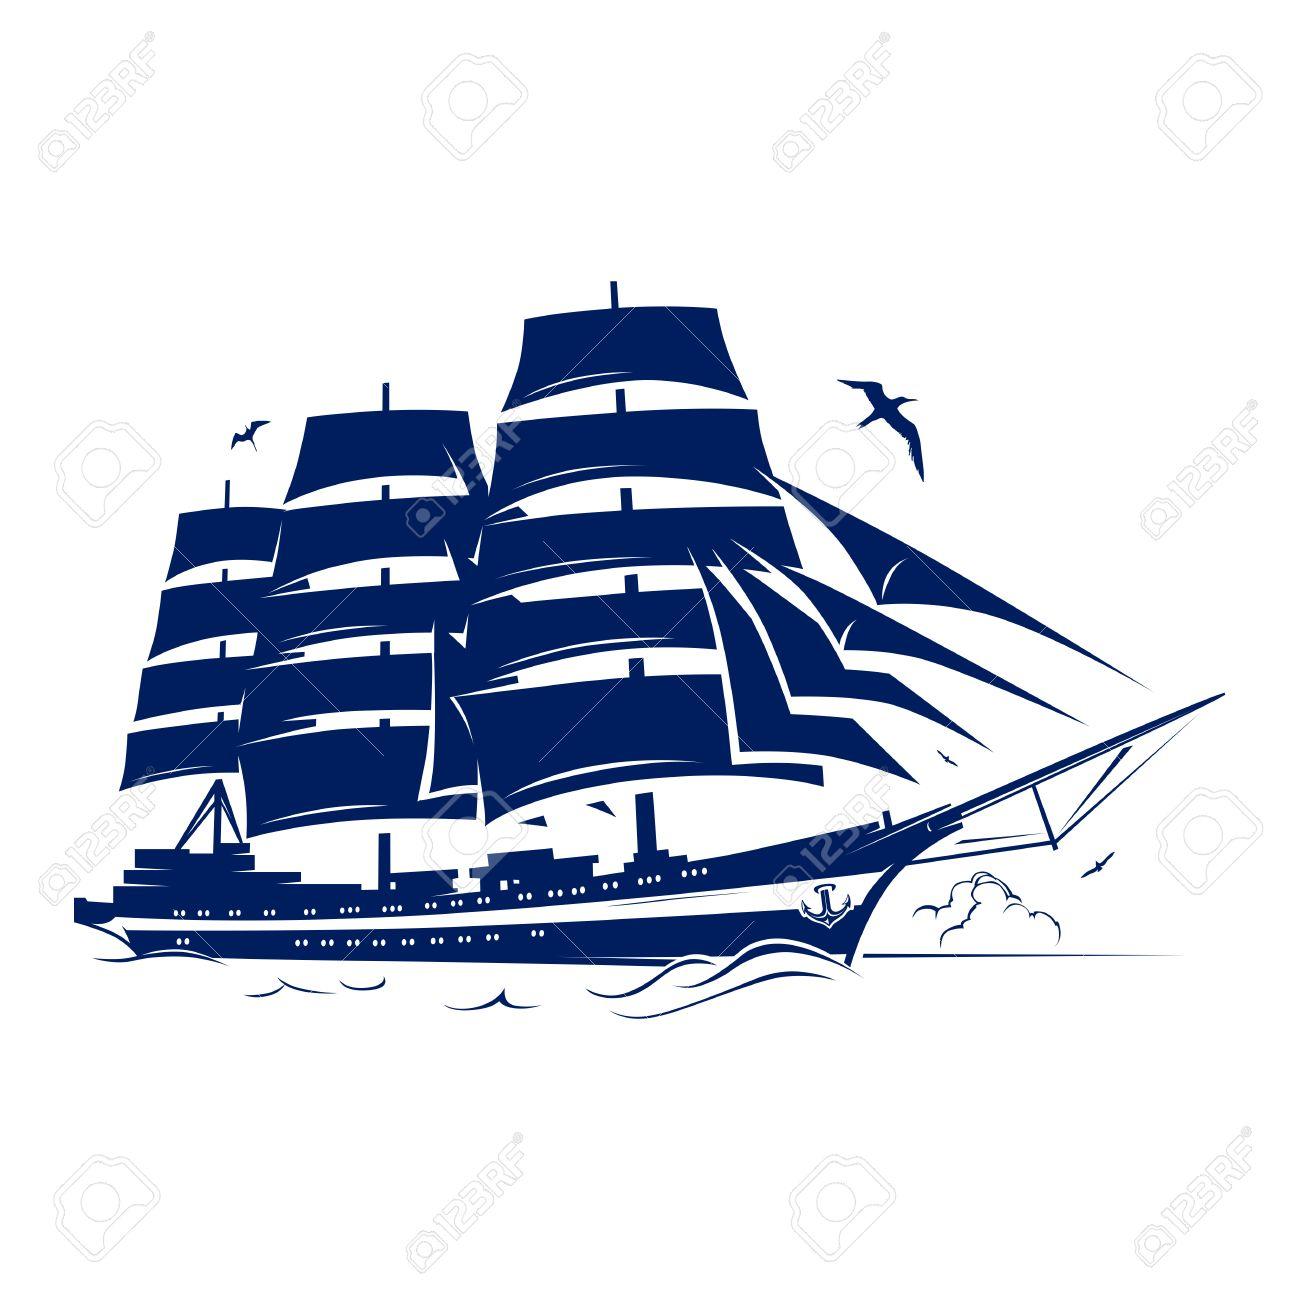 Sail ship Vector Illustration - 27447588